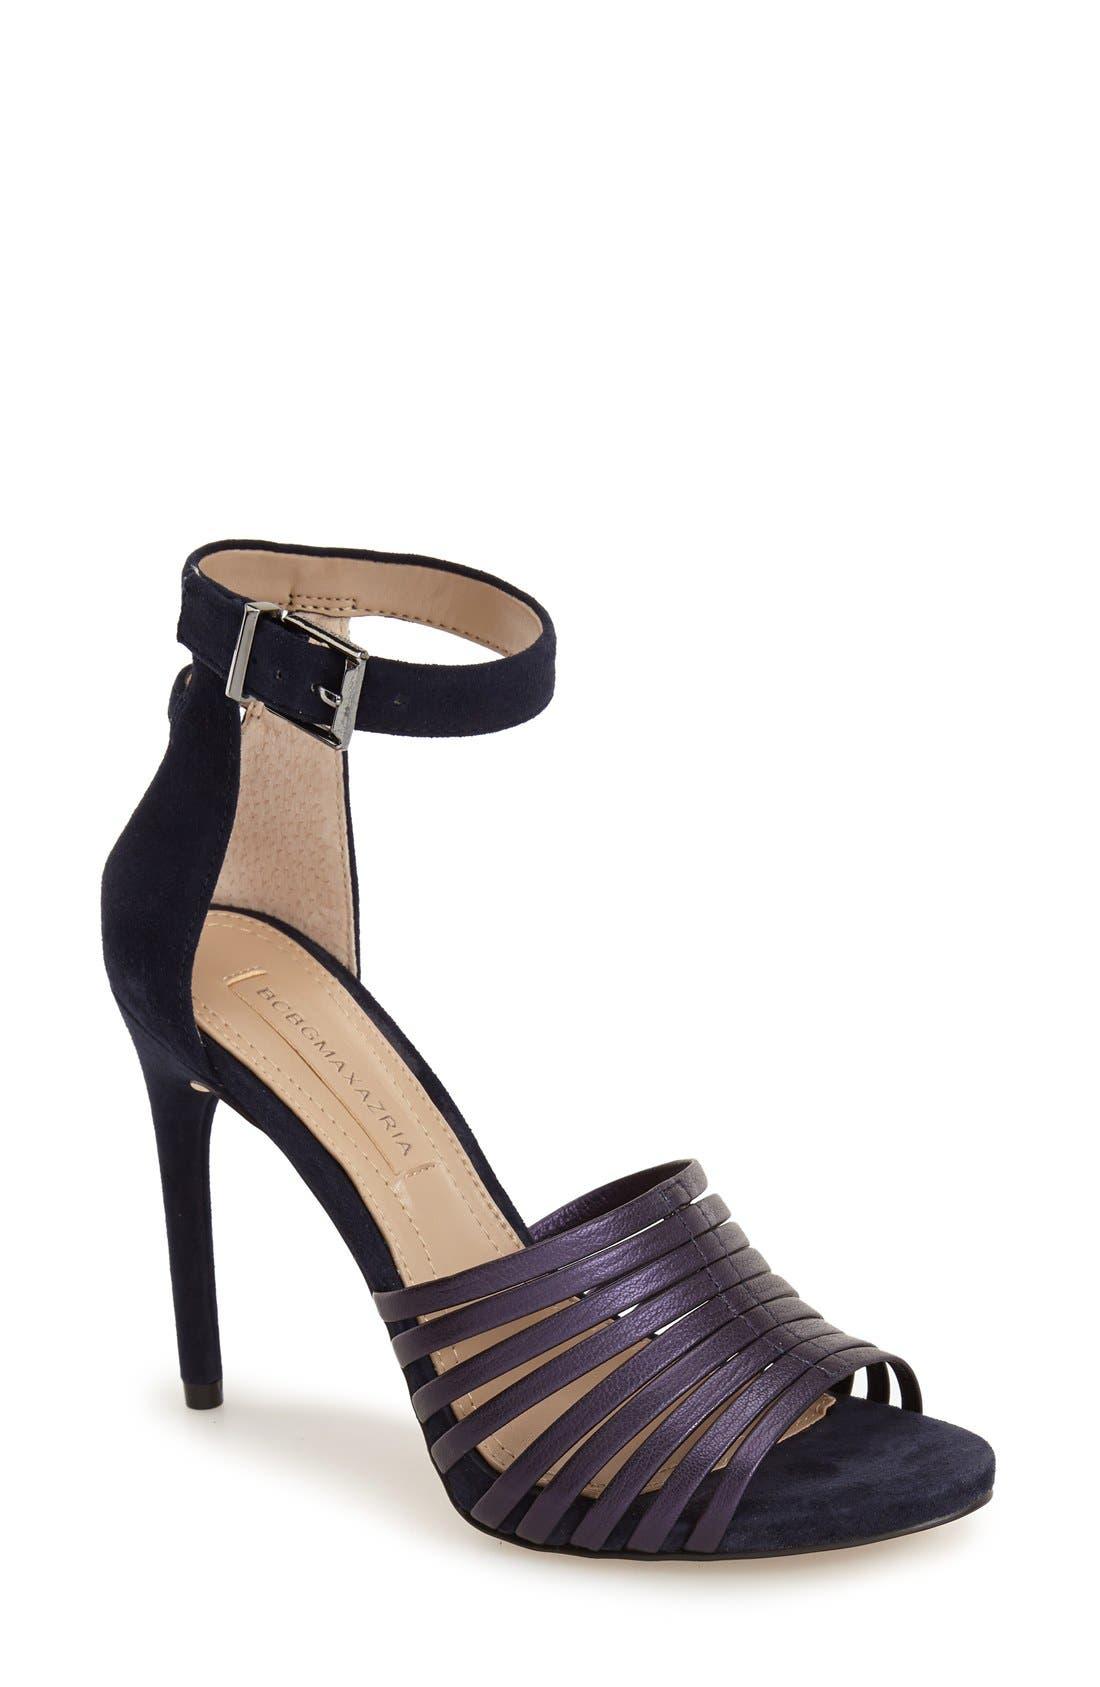 Main Image - BCBCMAXAZRIA 'Dena' Strappy Sandal (Women)